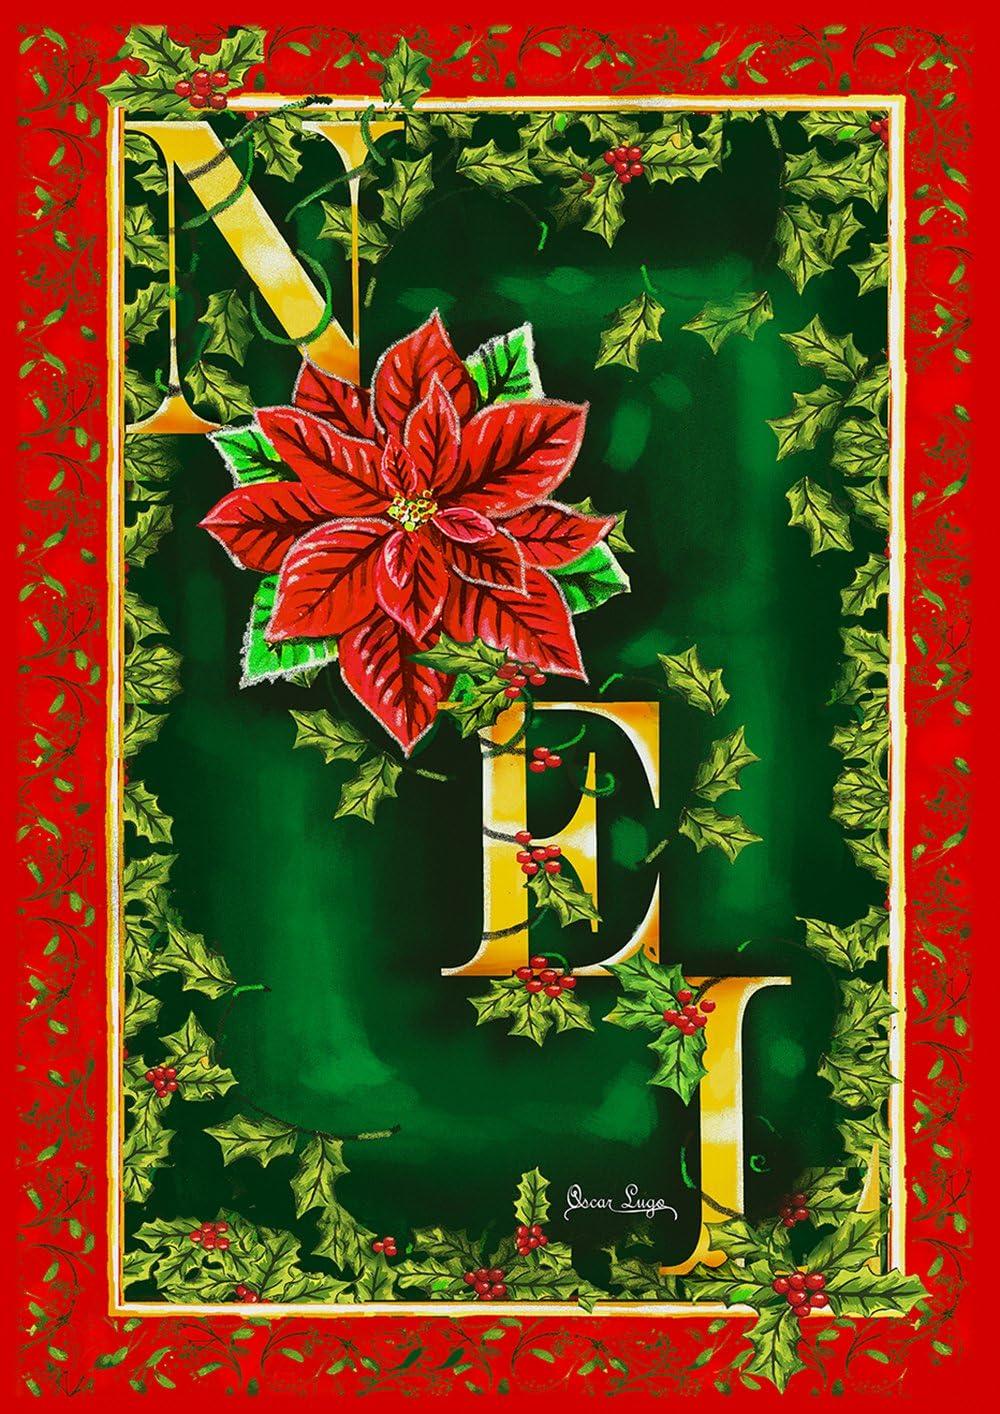 Toland Home Garden Noel 28 x 40 Inch Decorative Christmas Holiday Poinsettia House Flag